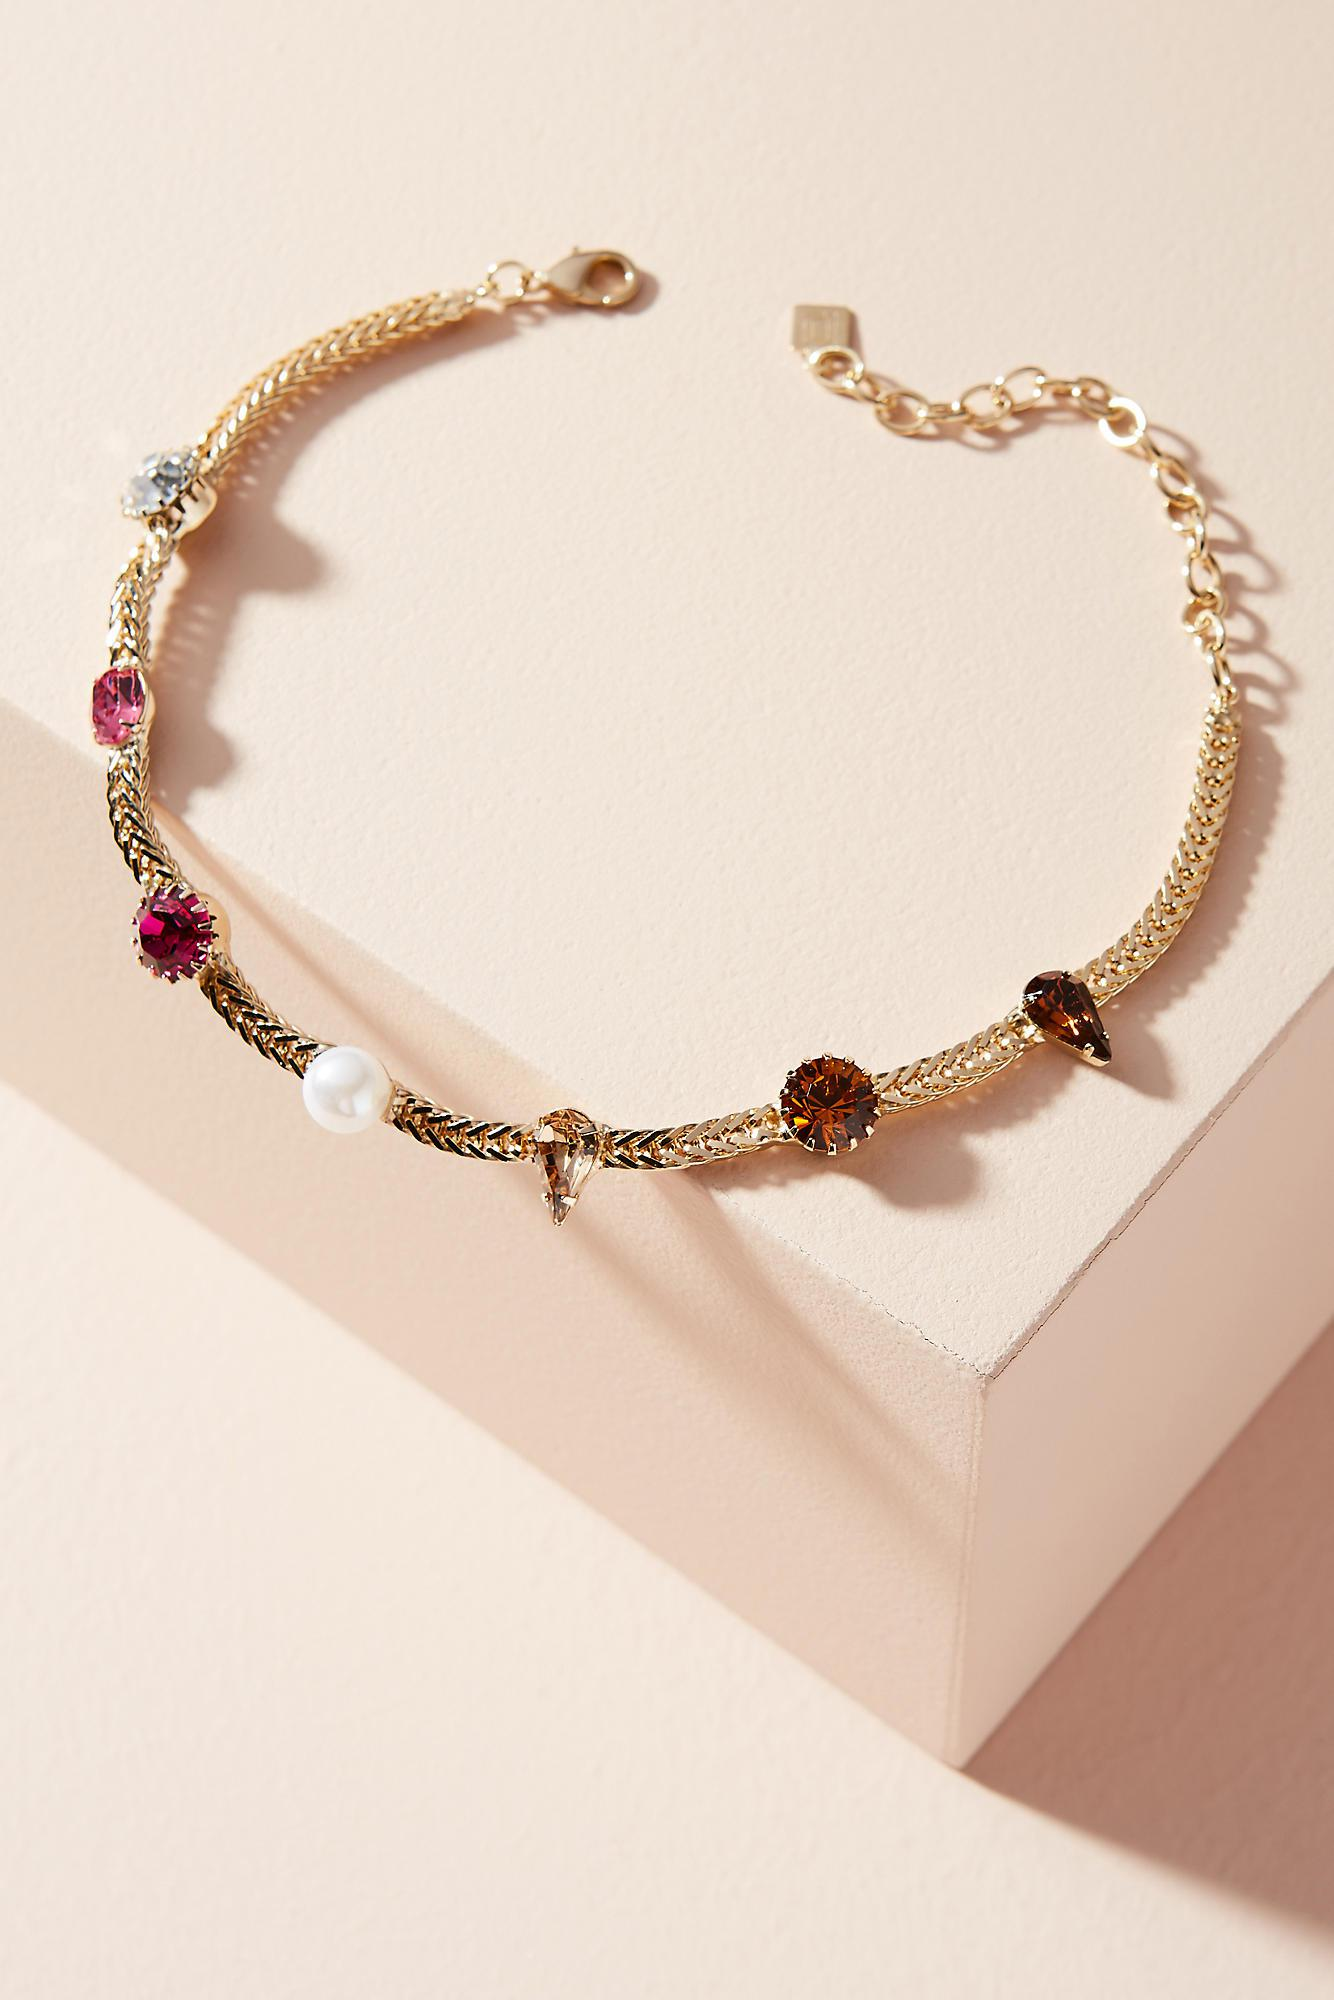 Dannijo Draven jewel embellished choker w0dhDH6iMa